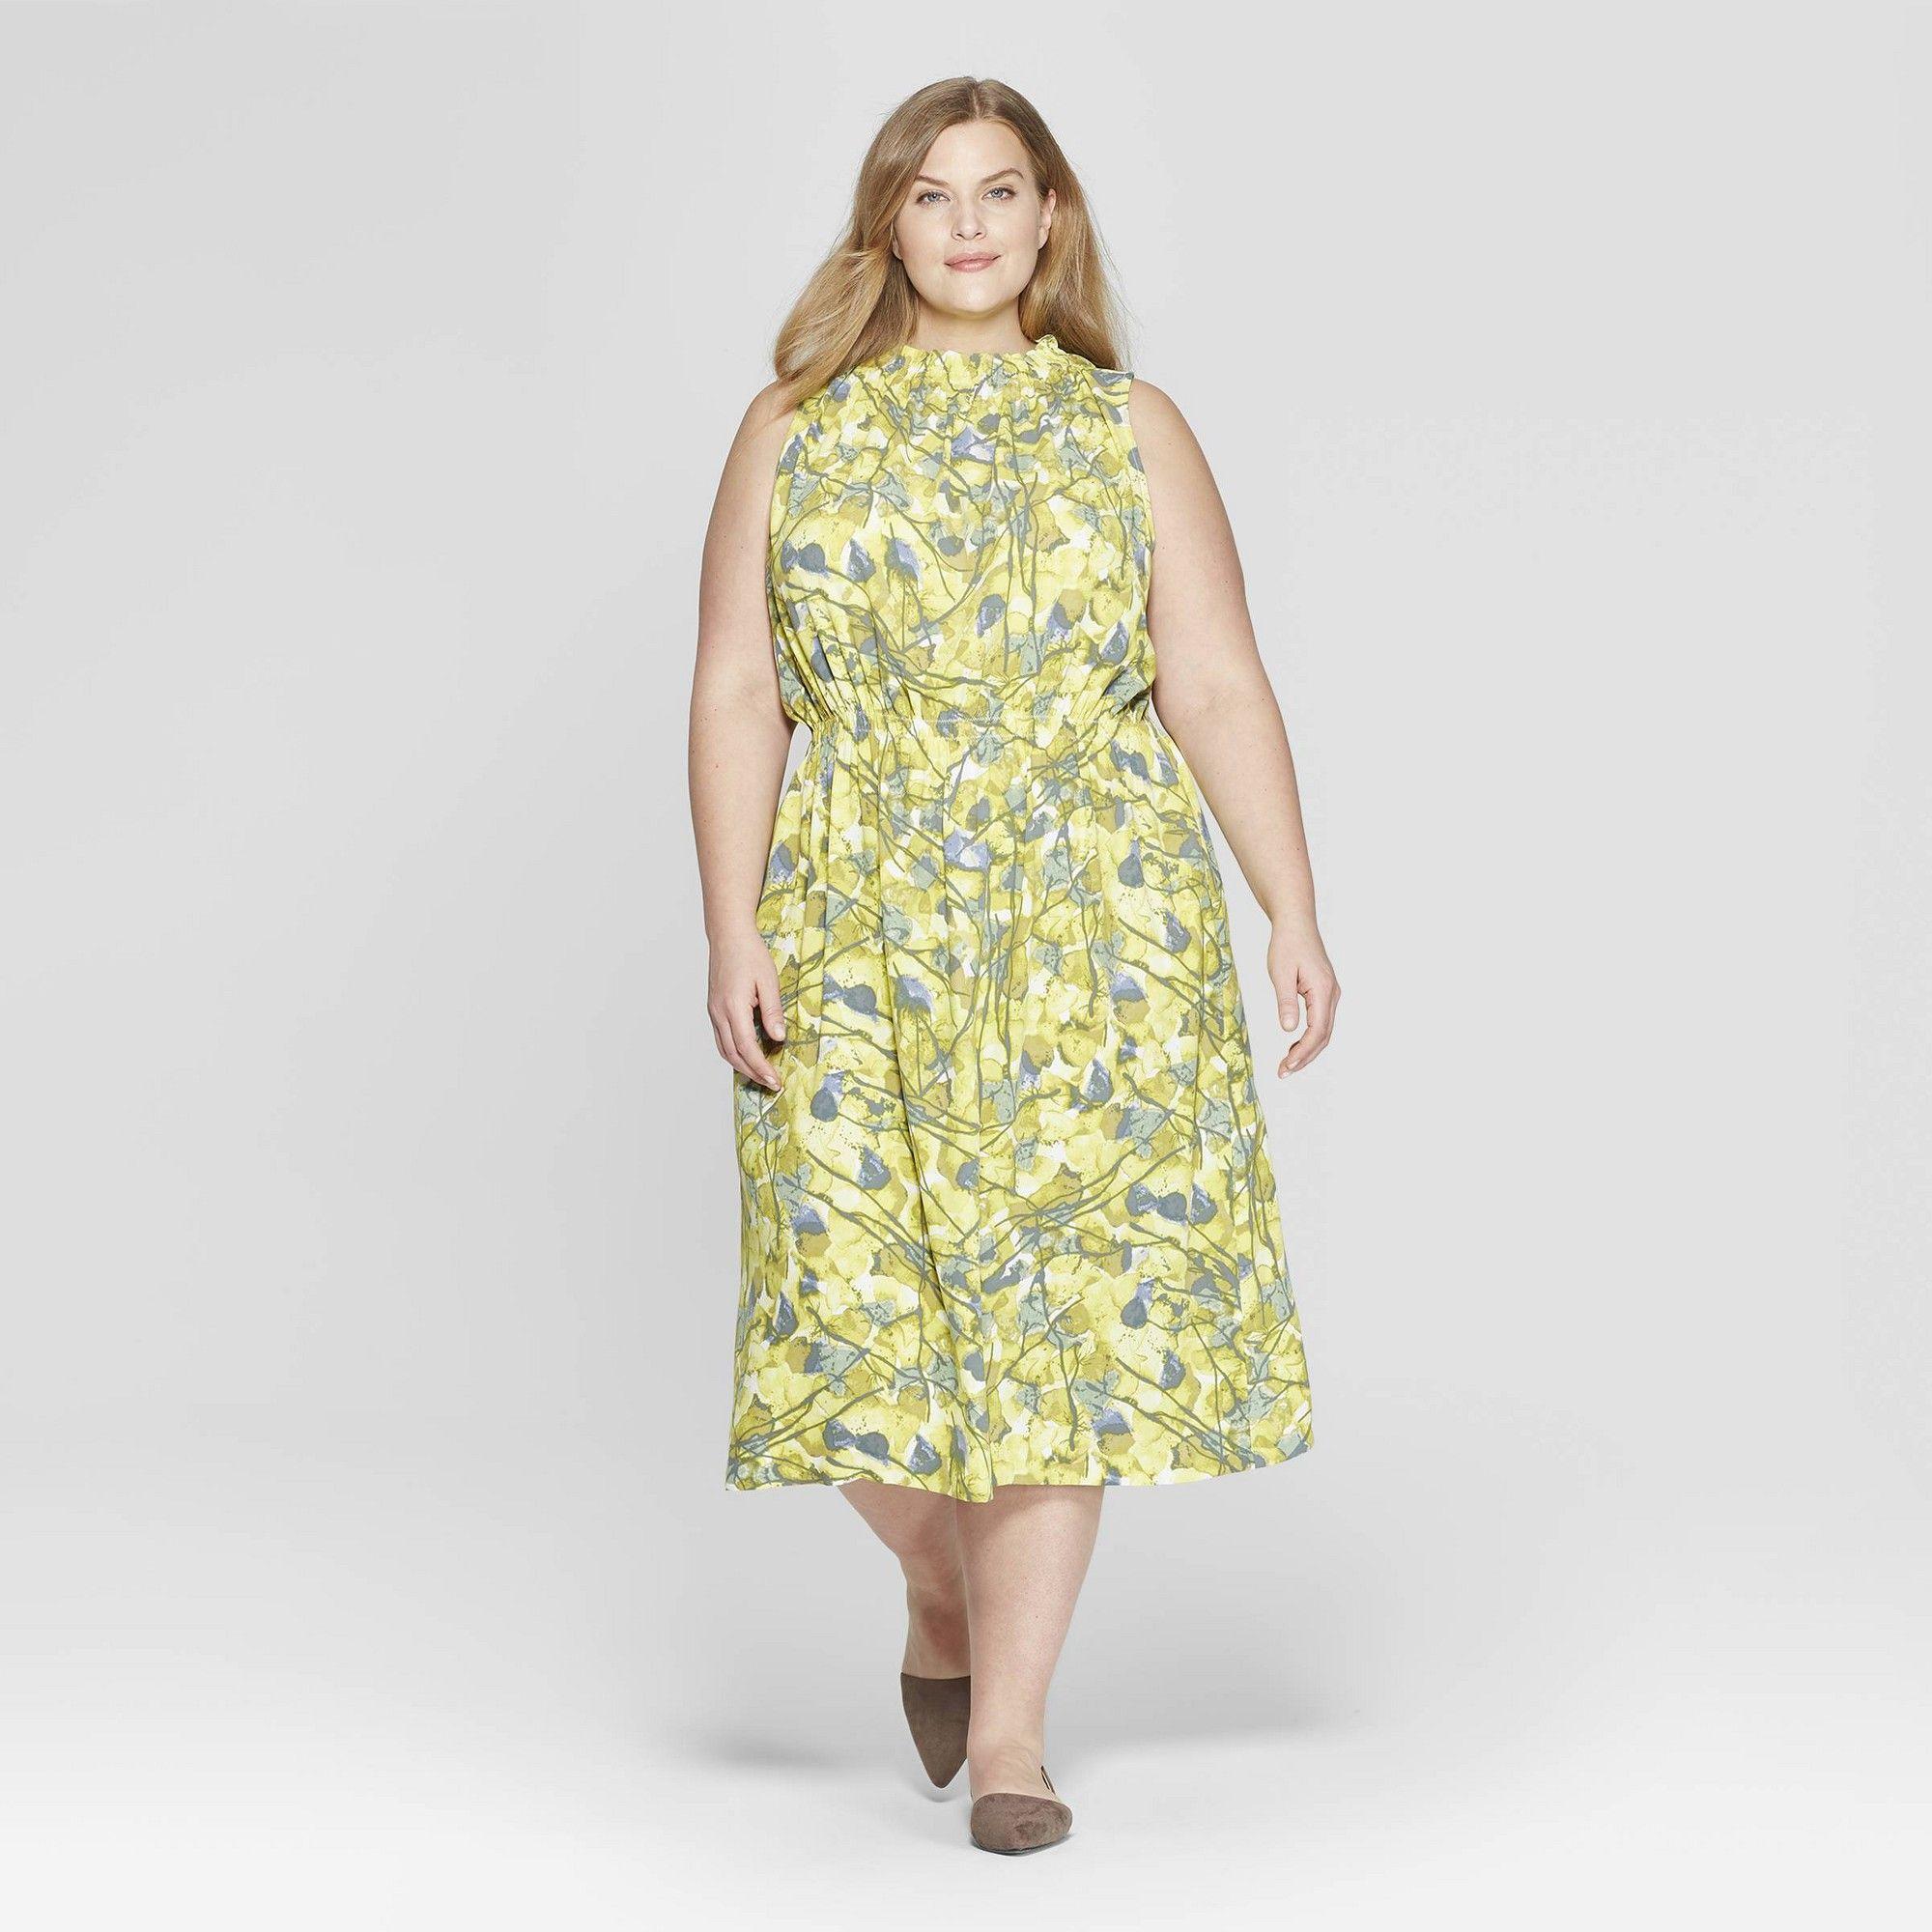 cd410220e72ba Women s Plus Size Floral Print Sleeveless Turtle Neck Dress - Prologue White  1X